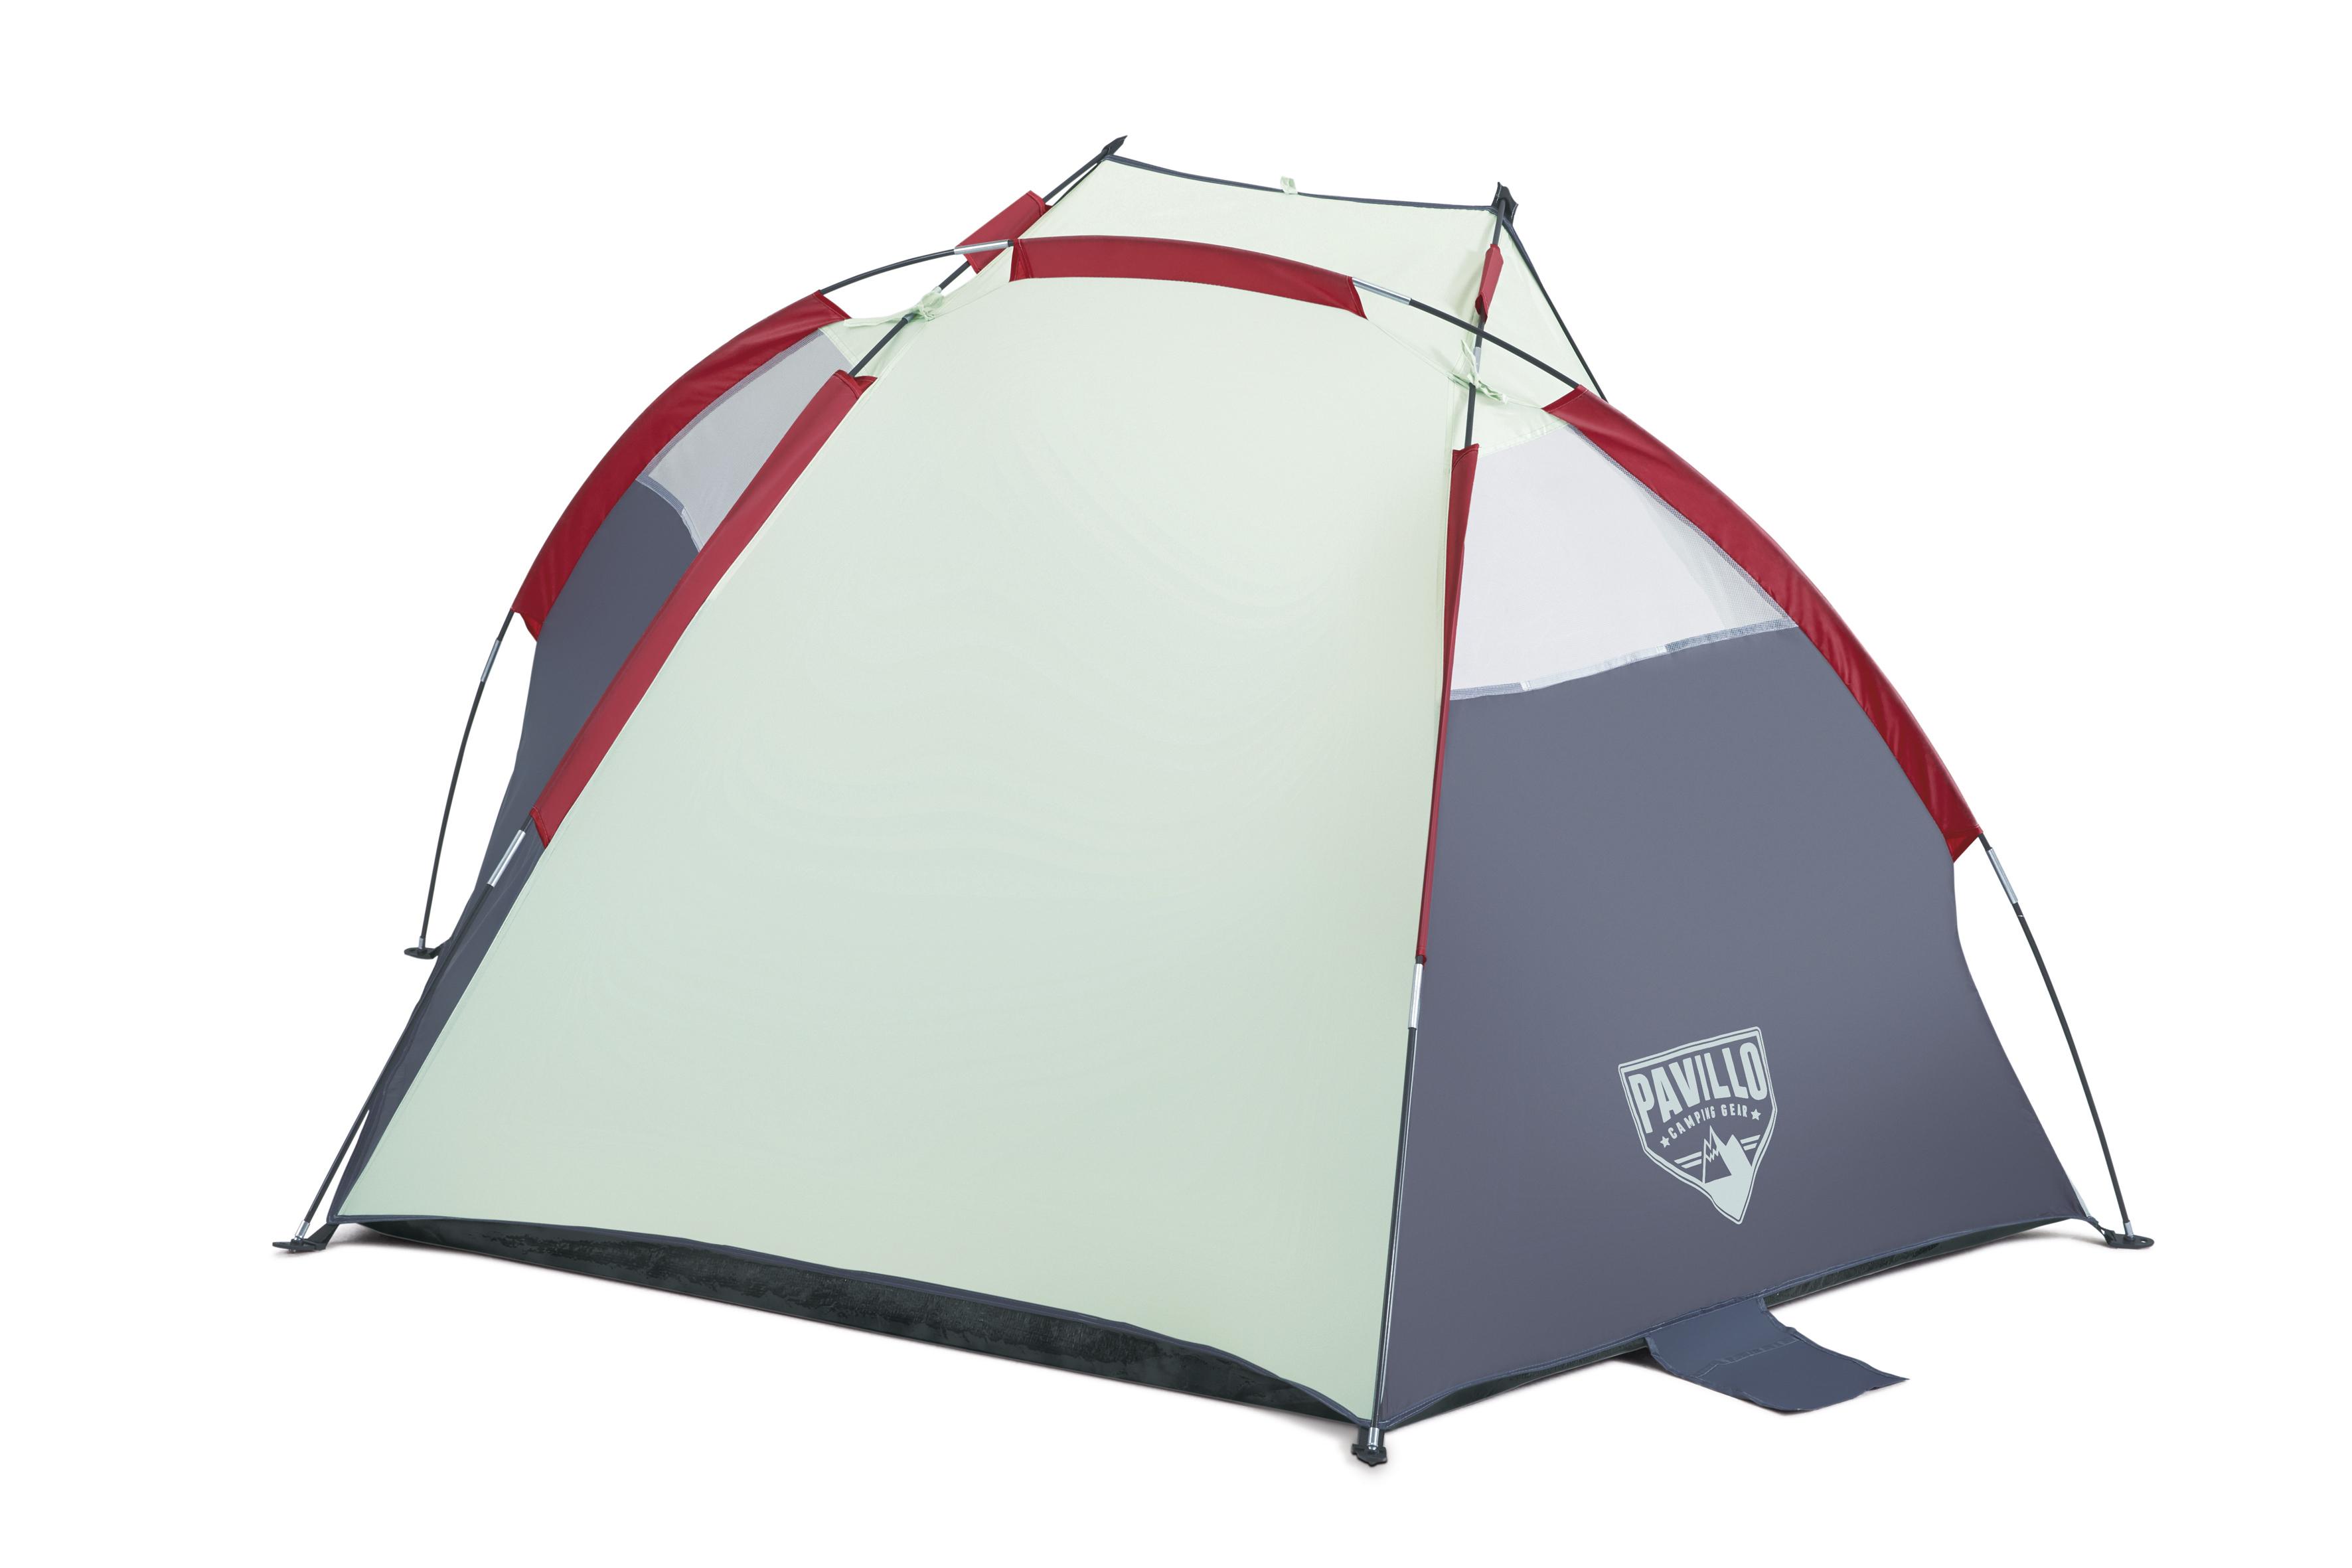 Bestway Ramble X2 Beach Tent